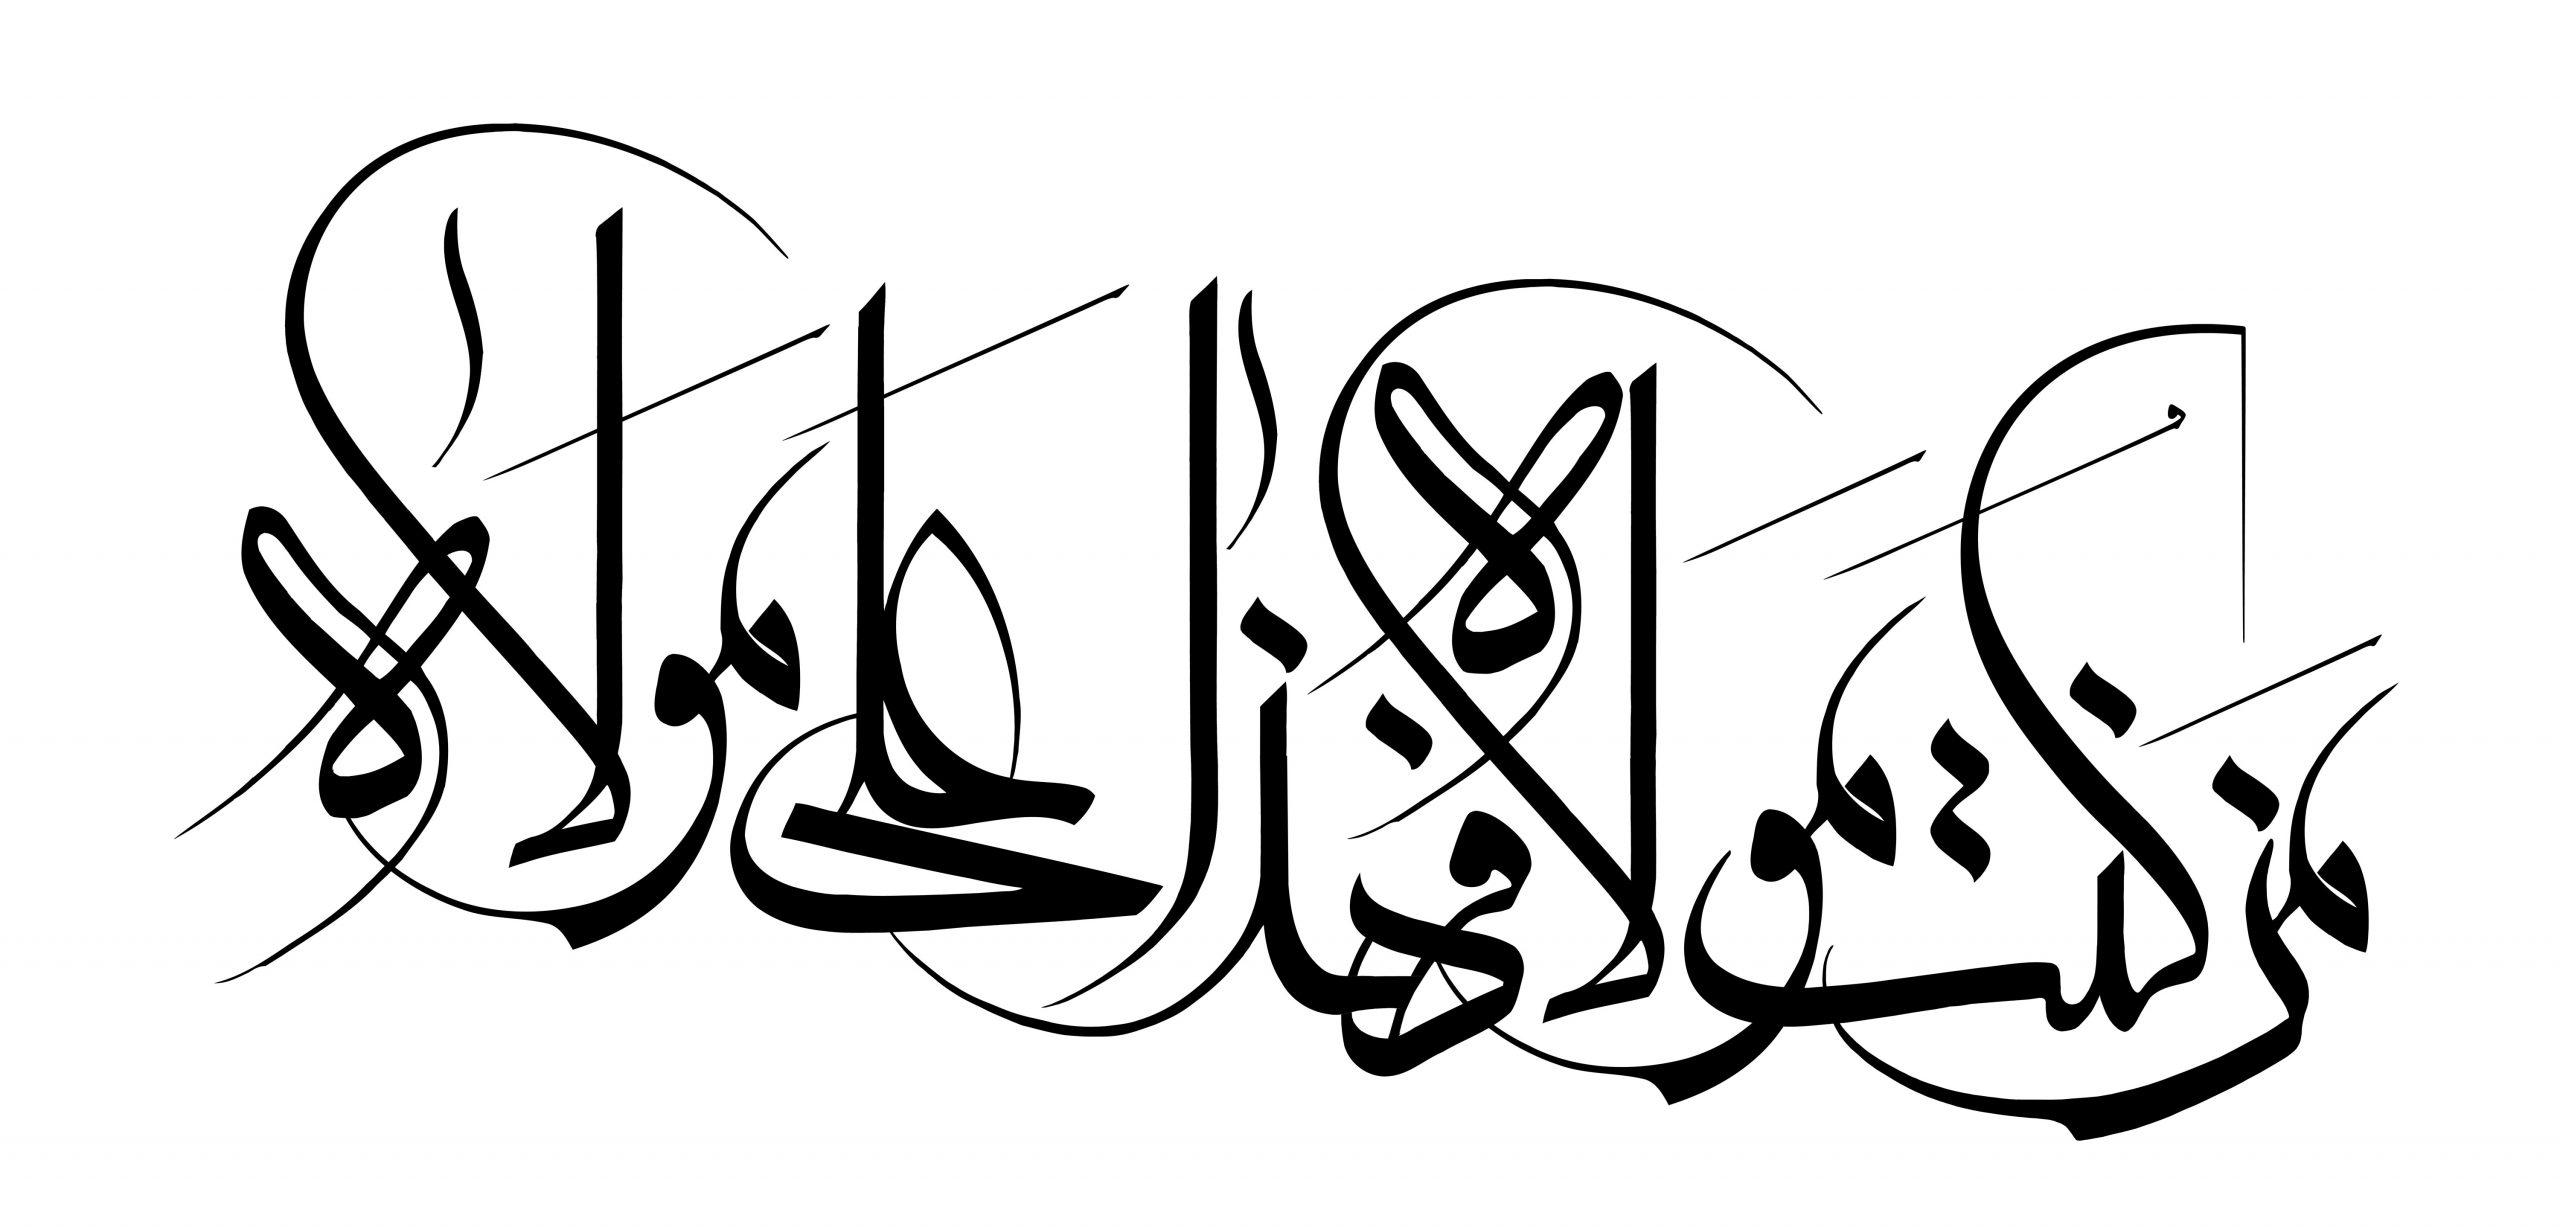 محمد دى پېغـــــــــــــــمبر،علي ولي